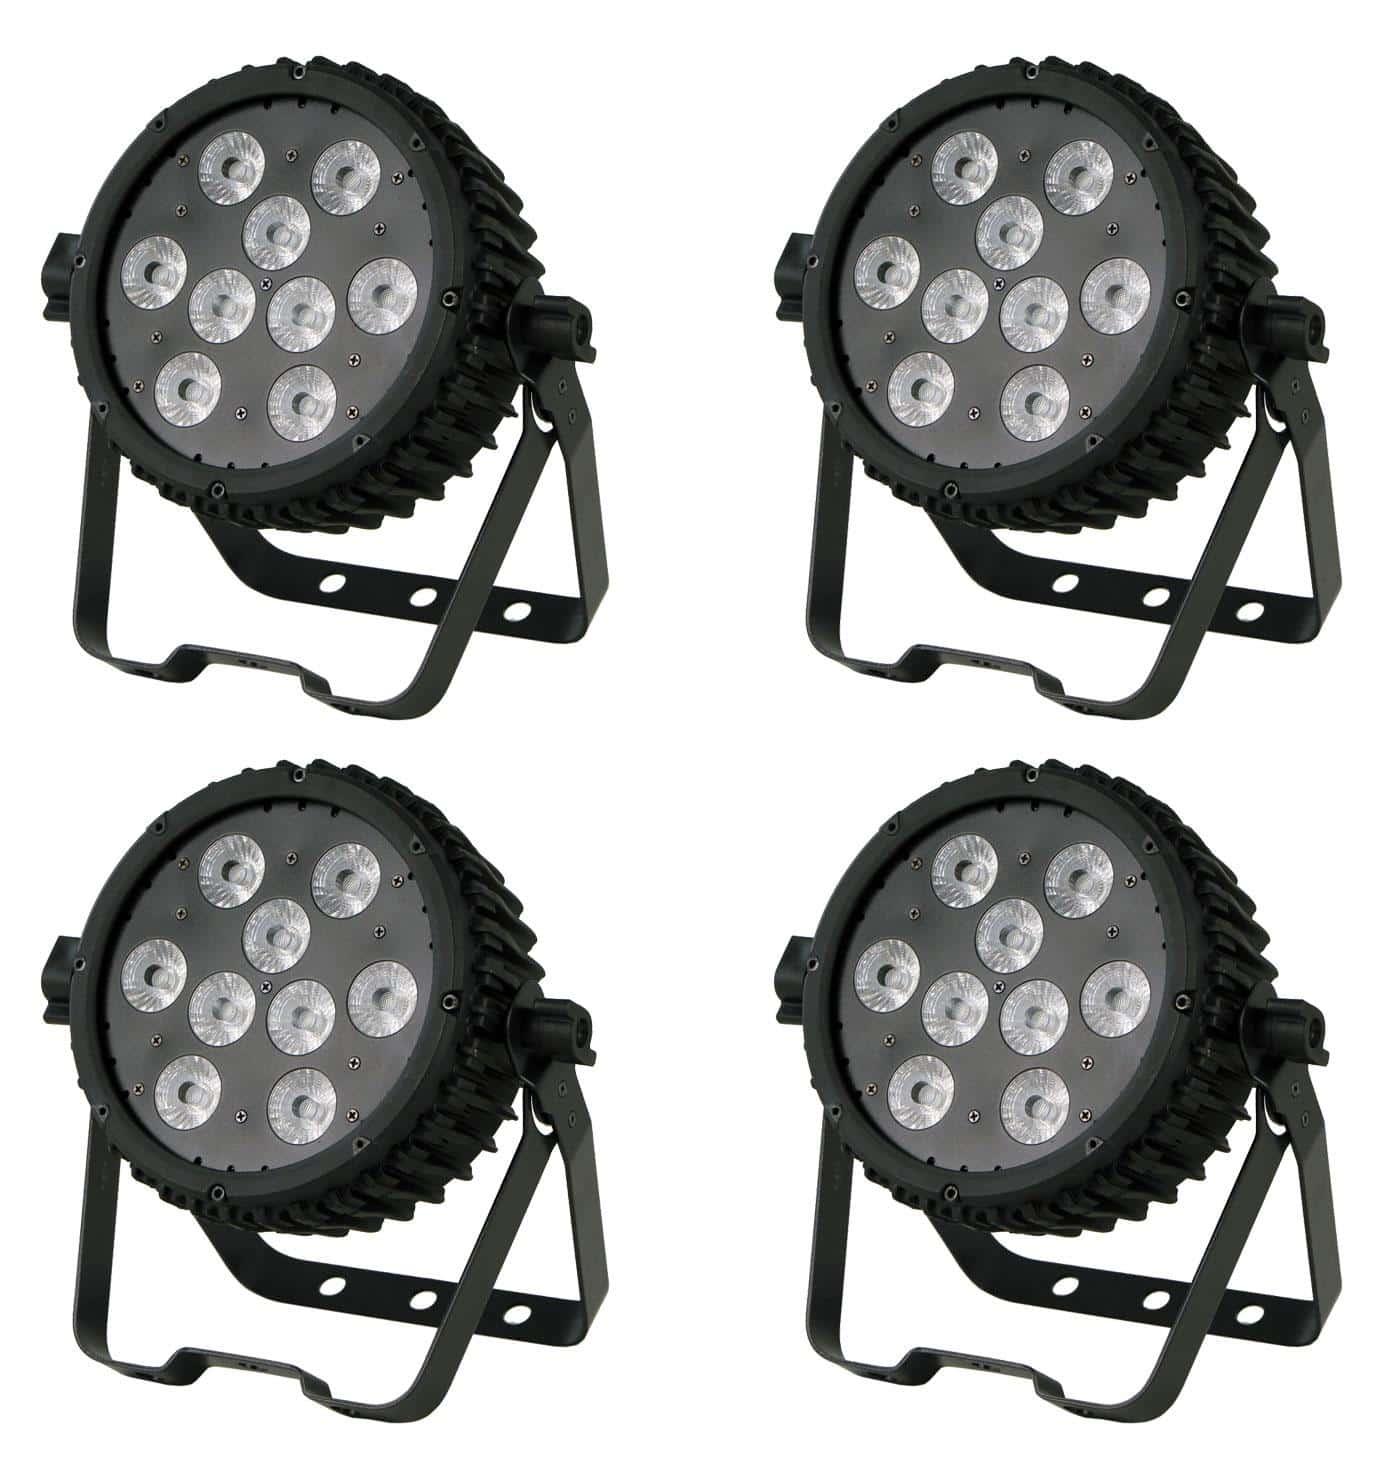 Involight LEDSPOT95 Silent LED Scheinwerfer 4er Set